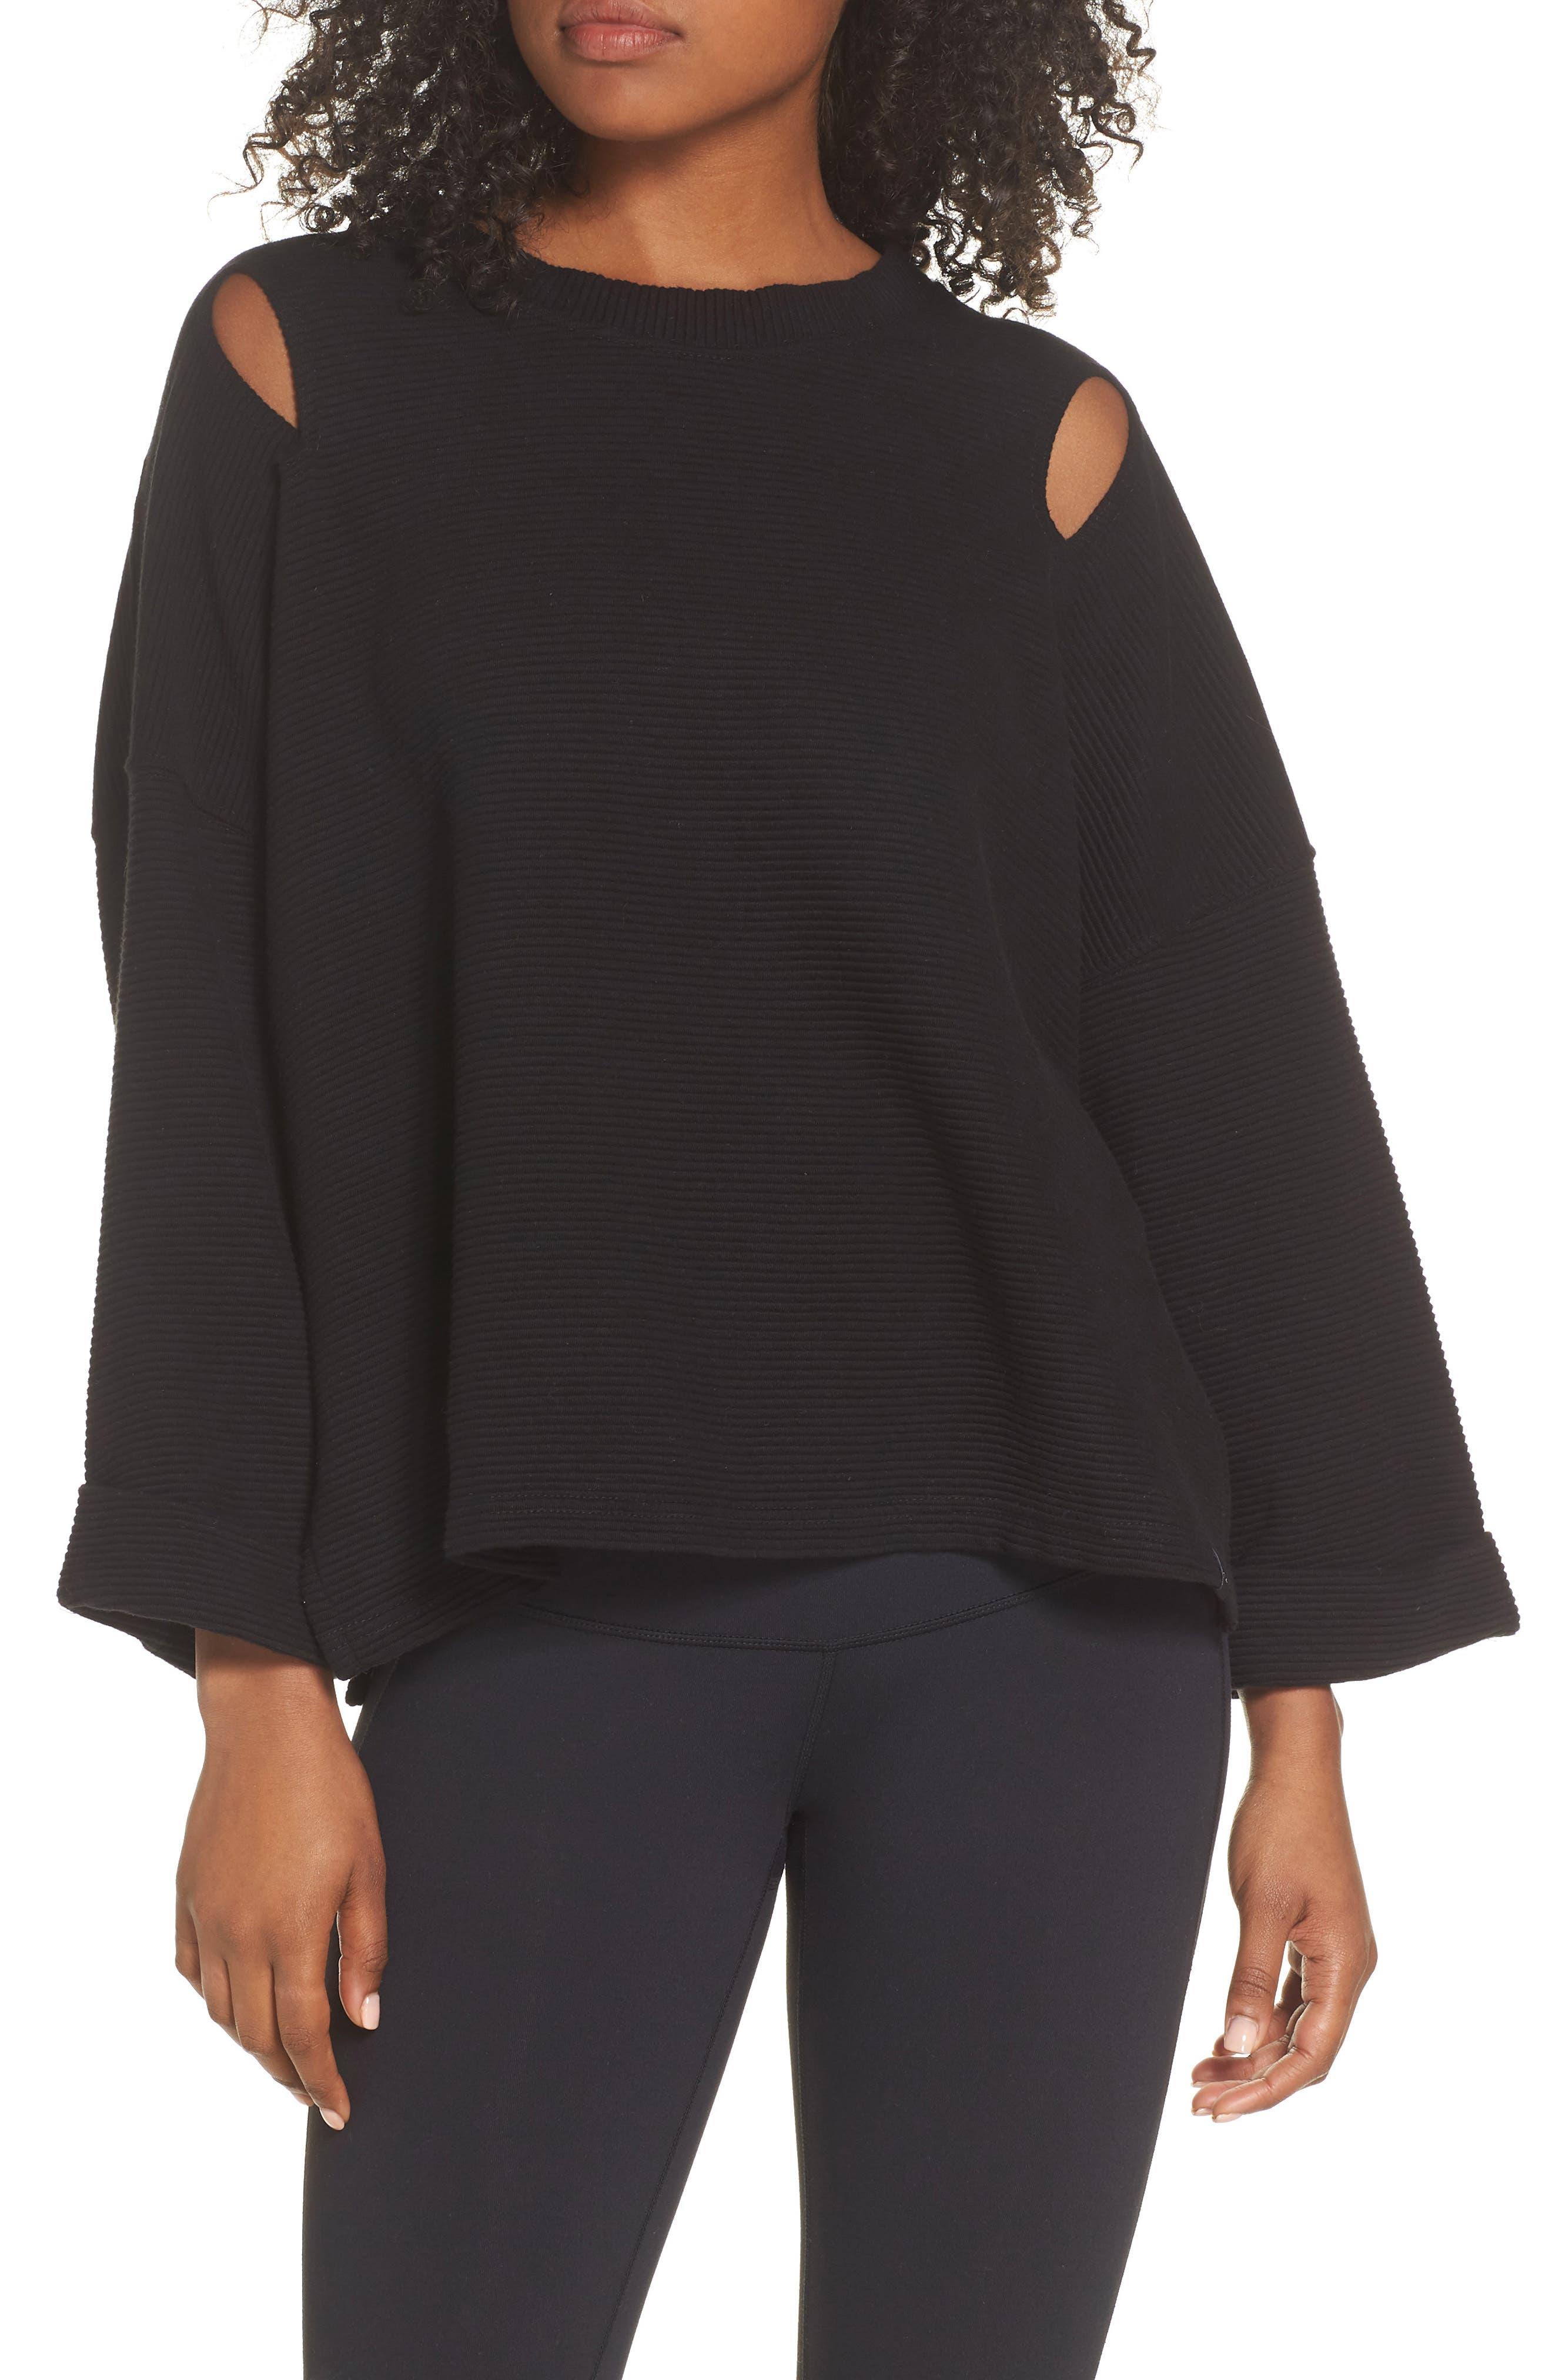 Jenny Sweatshirt,                         Main,                         color, 001